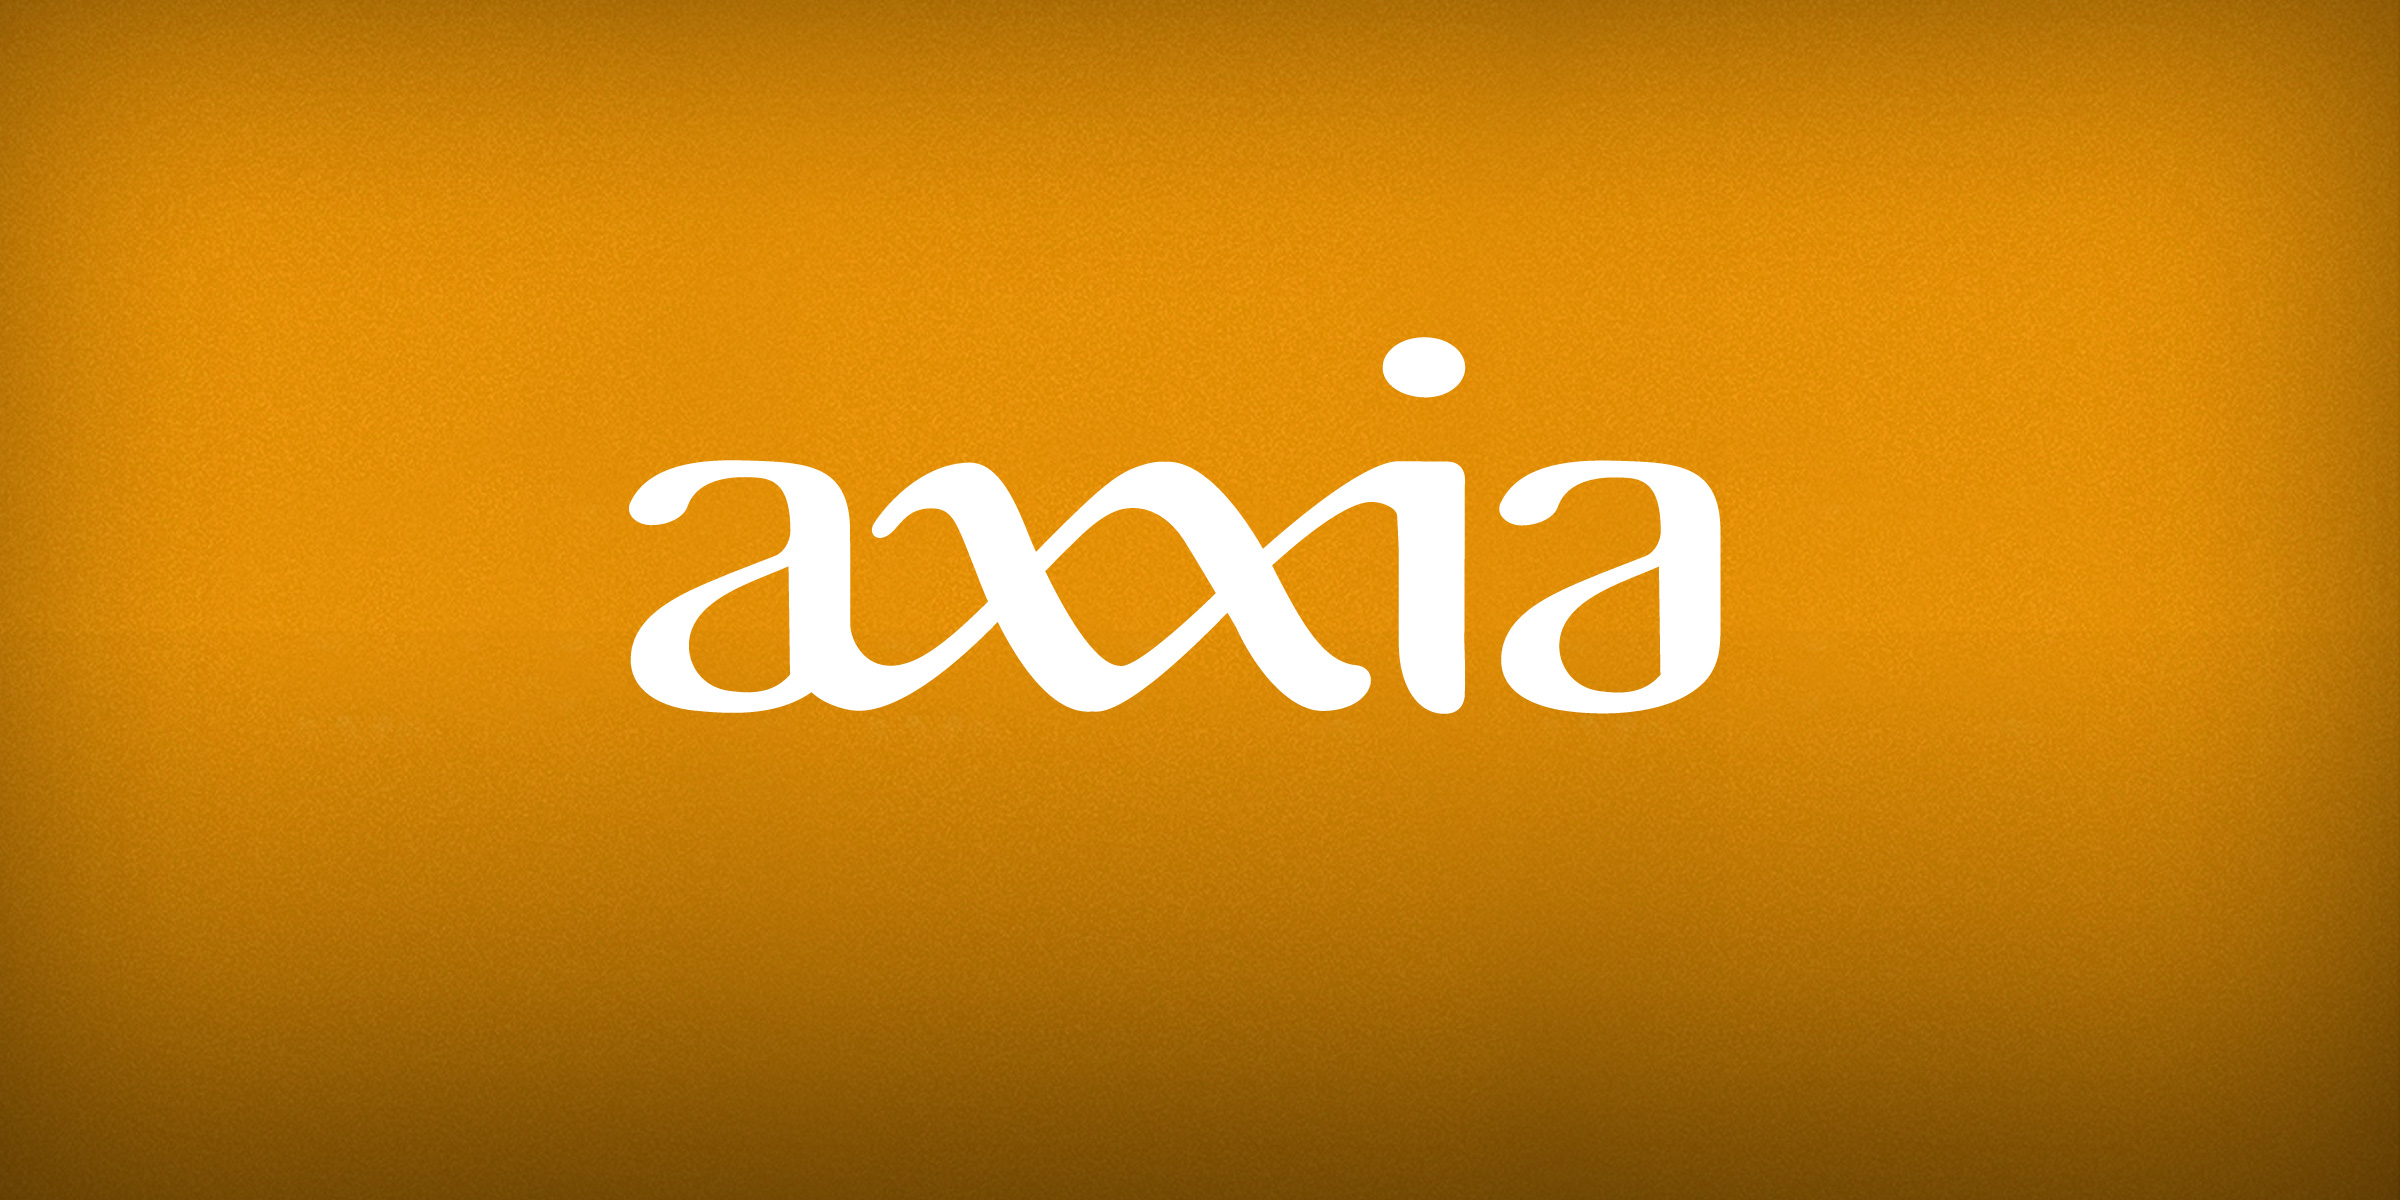 WebL-Laxxia.jpg